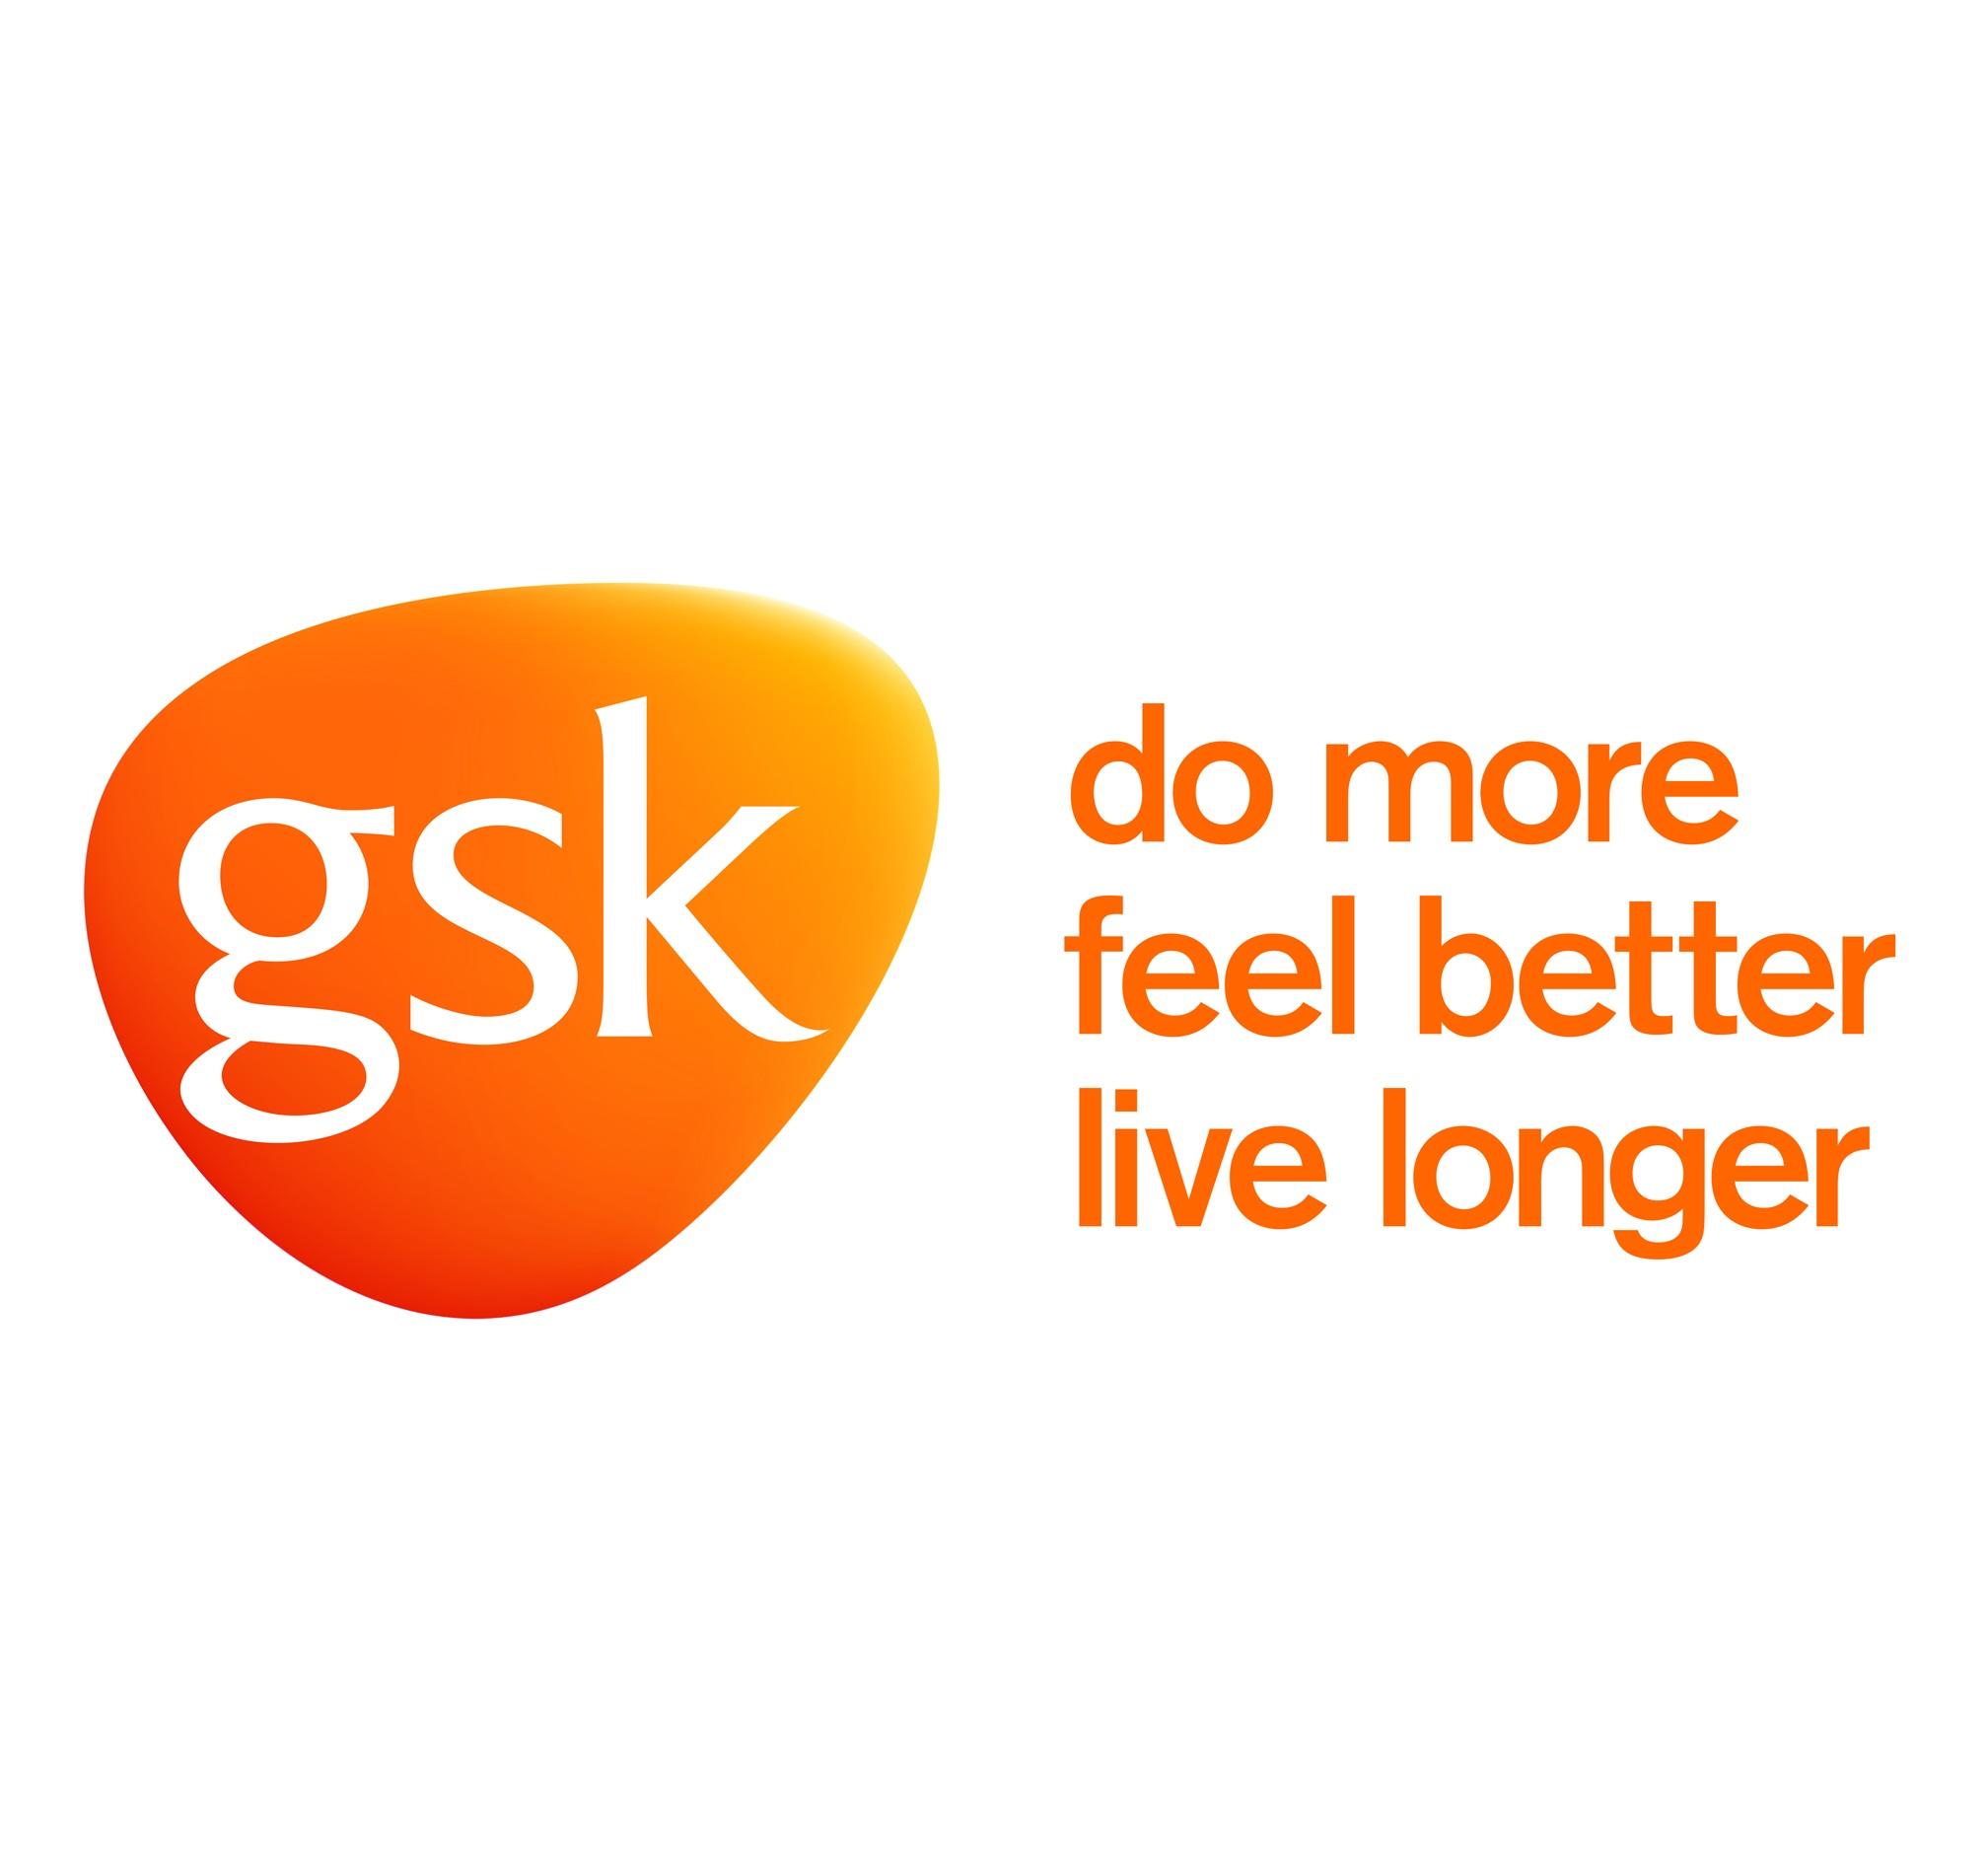 GSK-logo-and-slogan